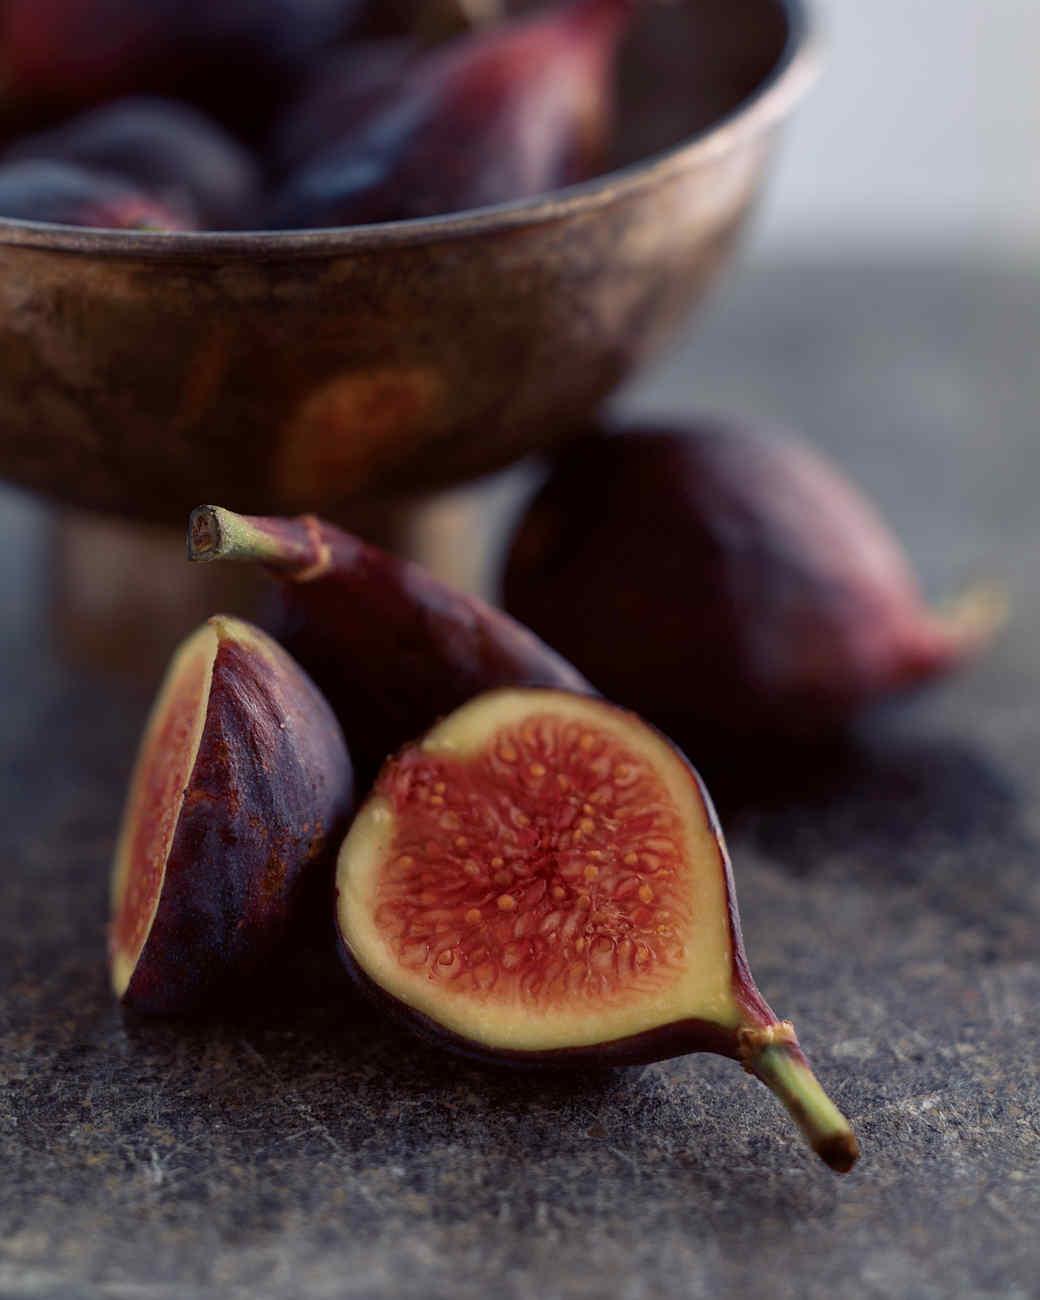 bs905_0905_figs.jpg